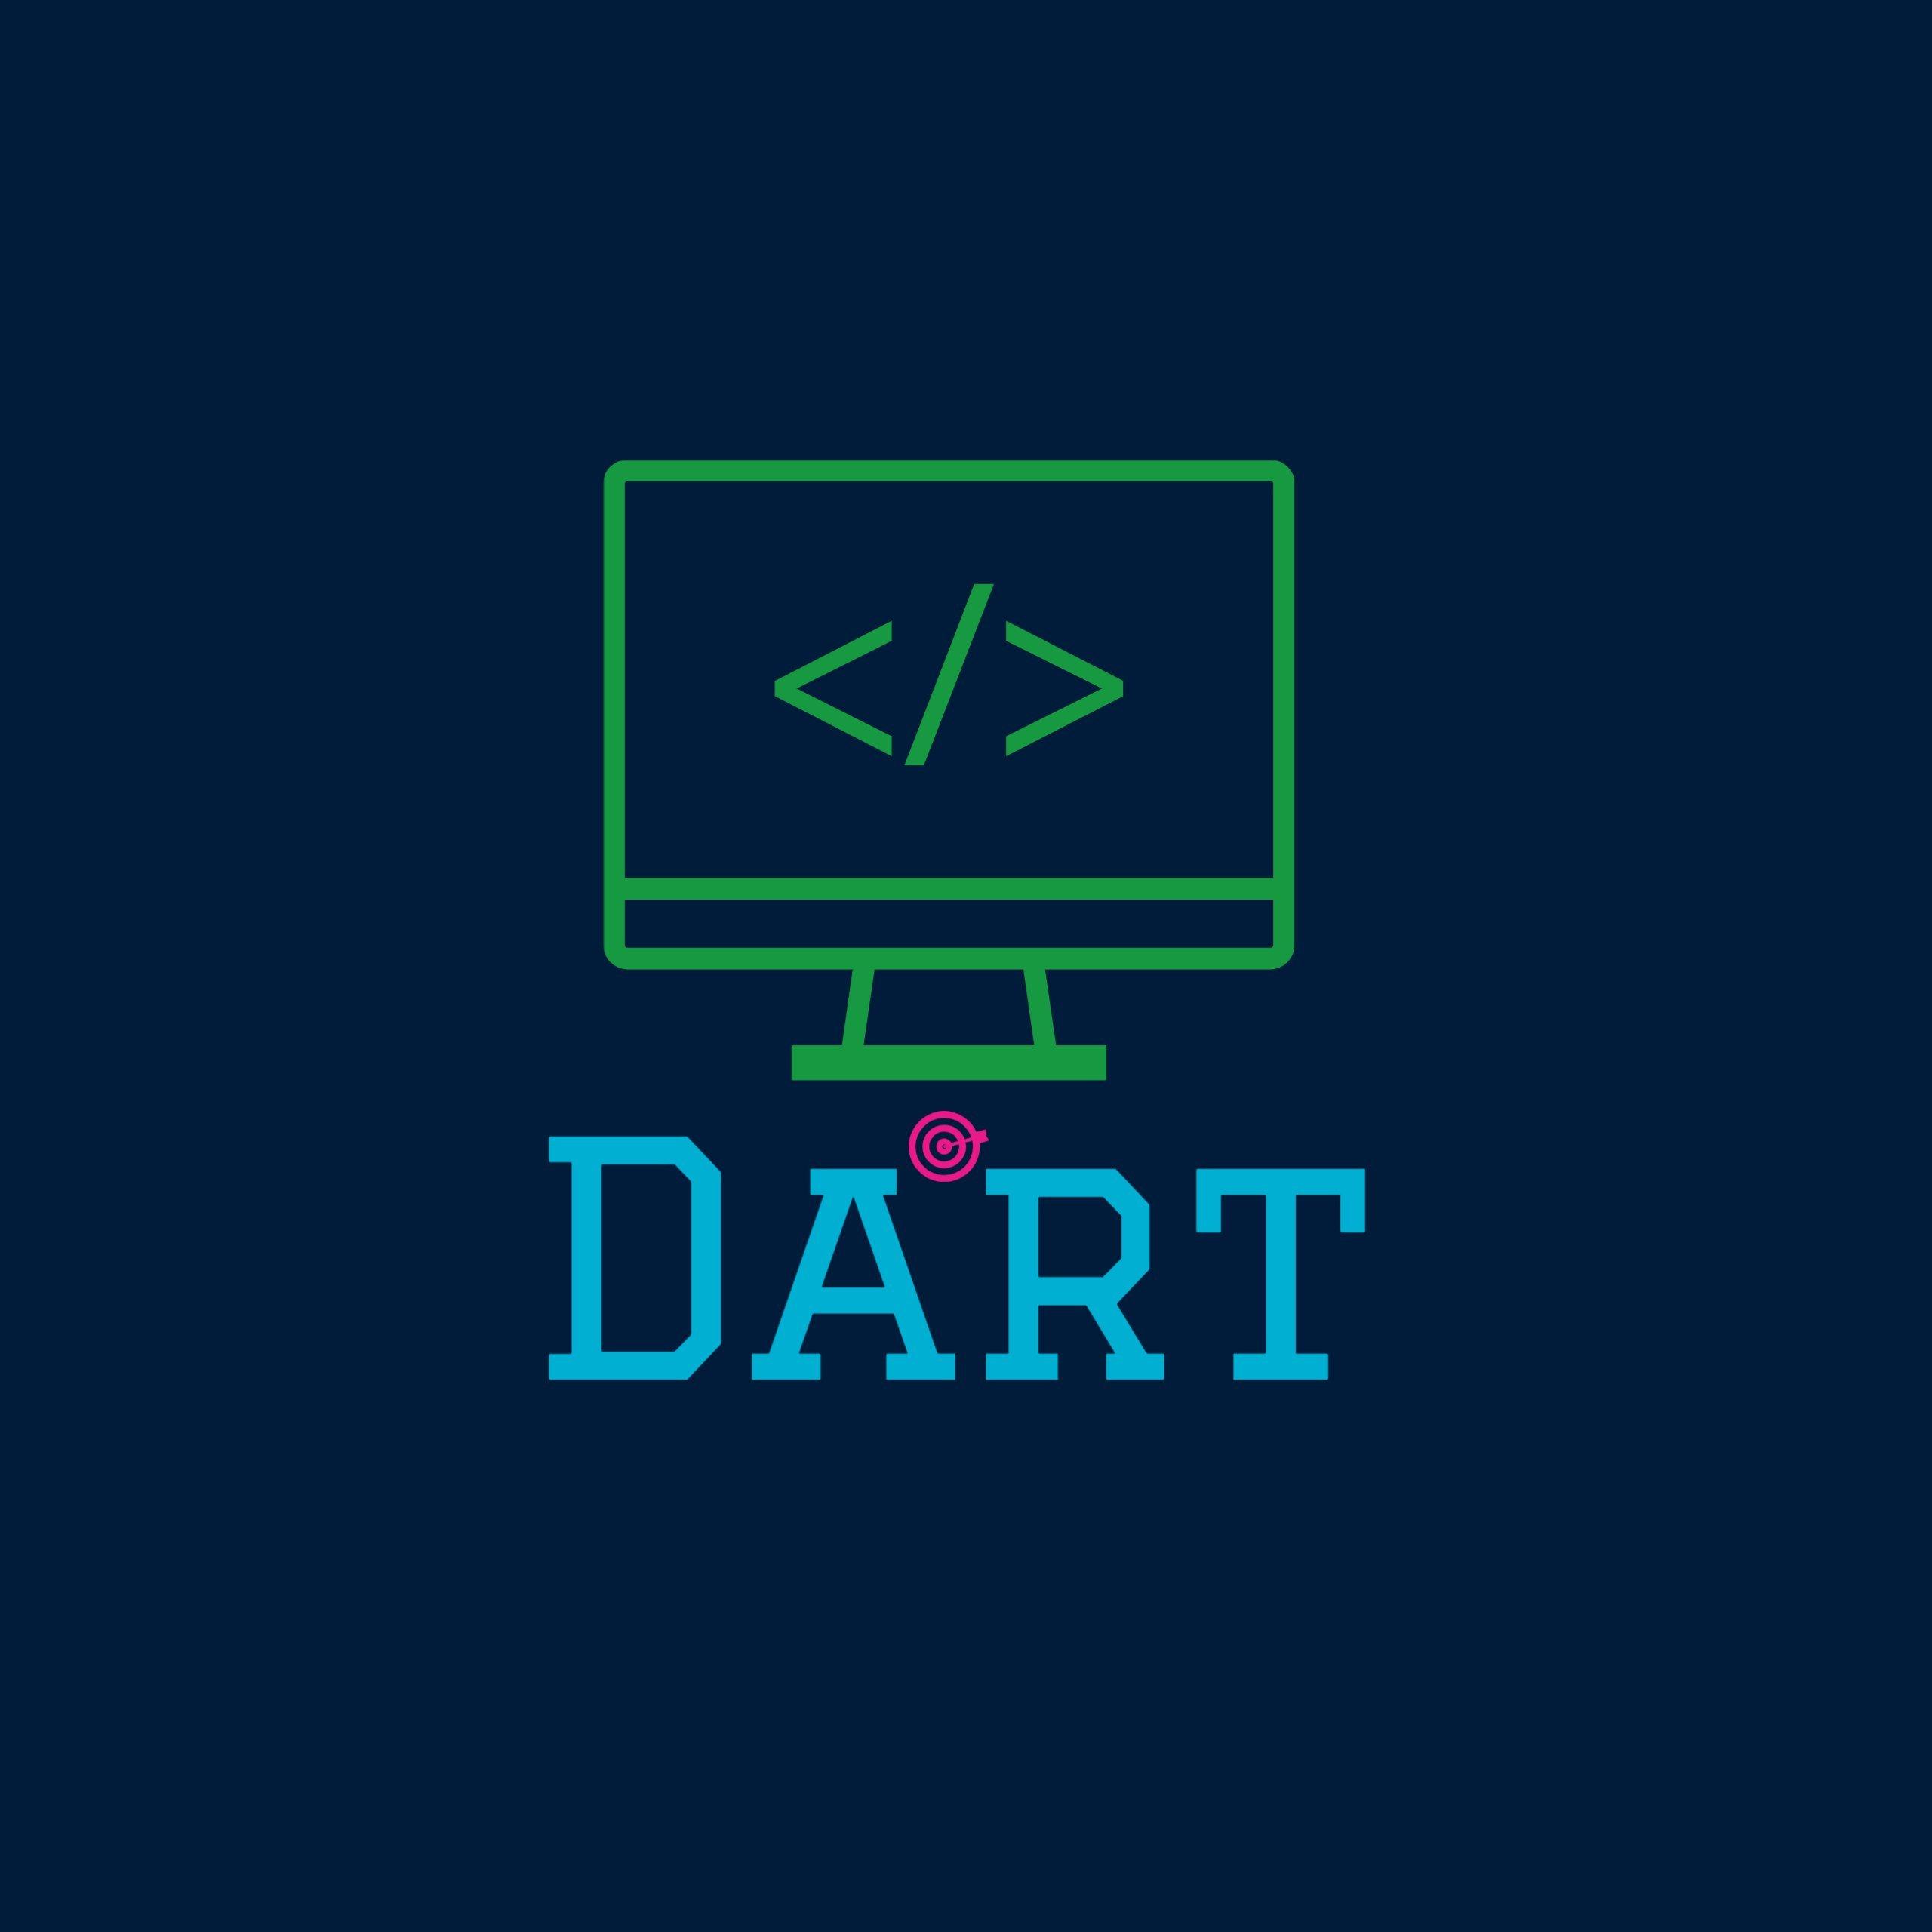 Web Development with Dart Programming Language: Create a Web App